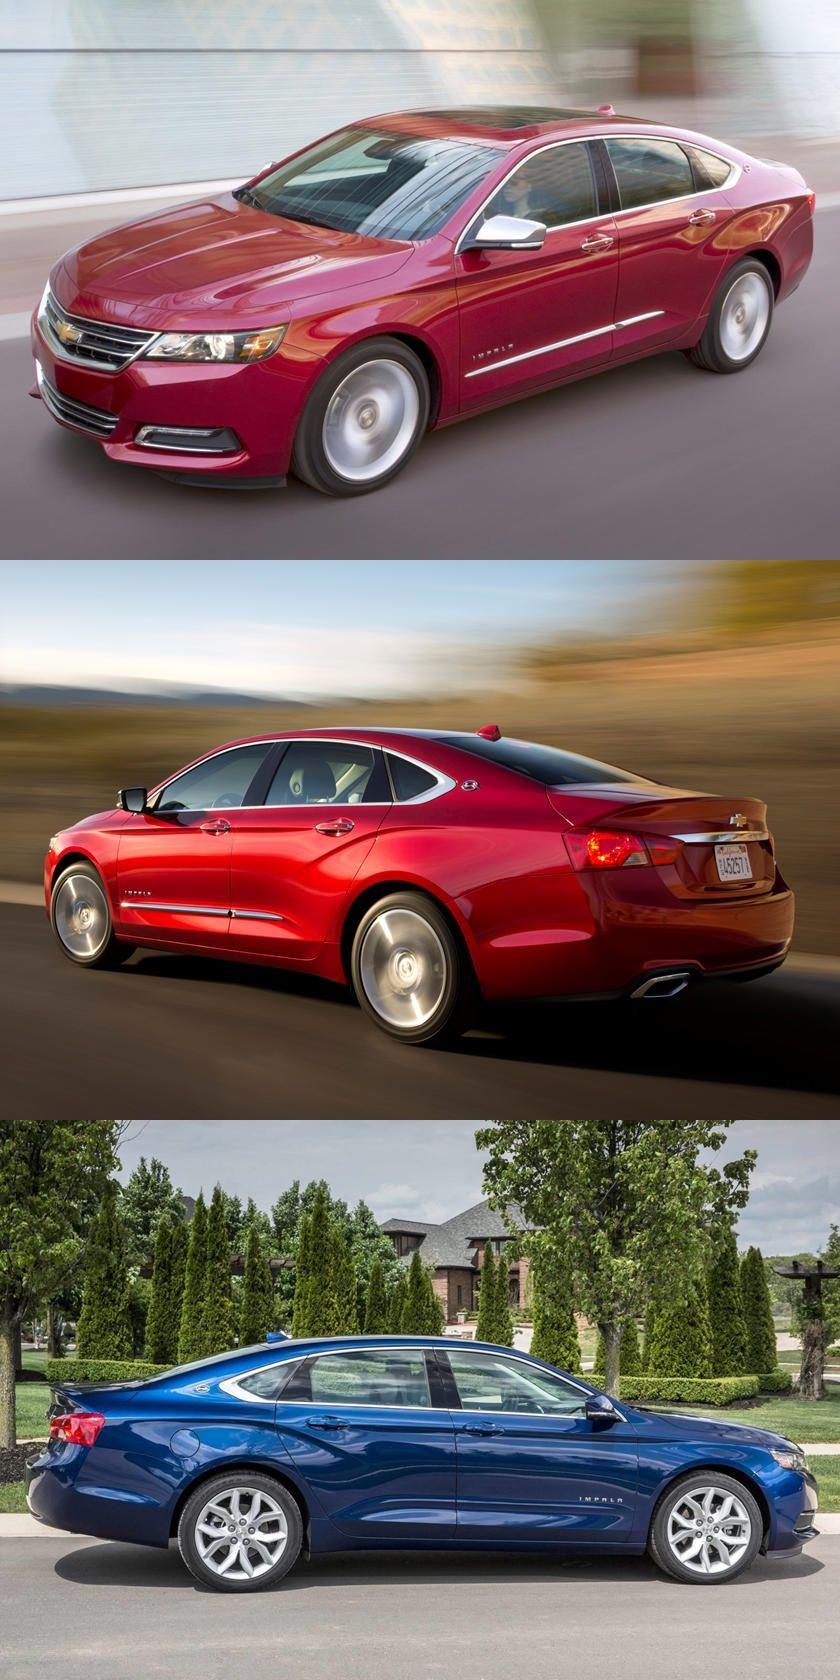 2020 Chevrolet Impala Now Cheaper Than 2019 Impala Chevrolet